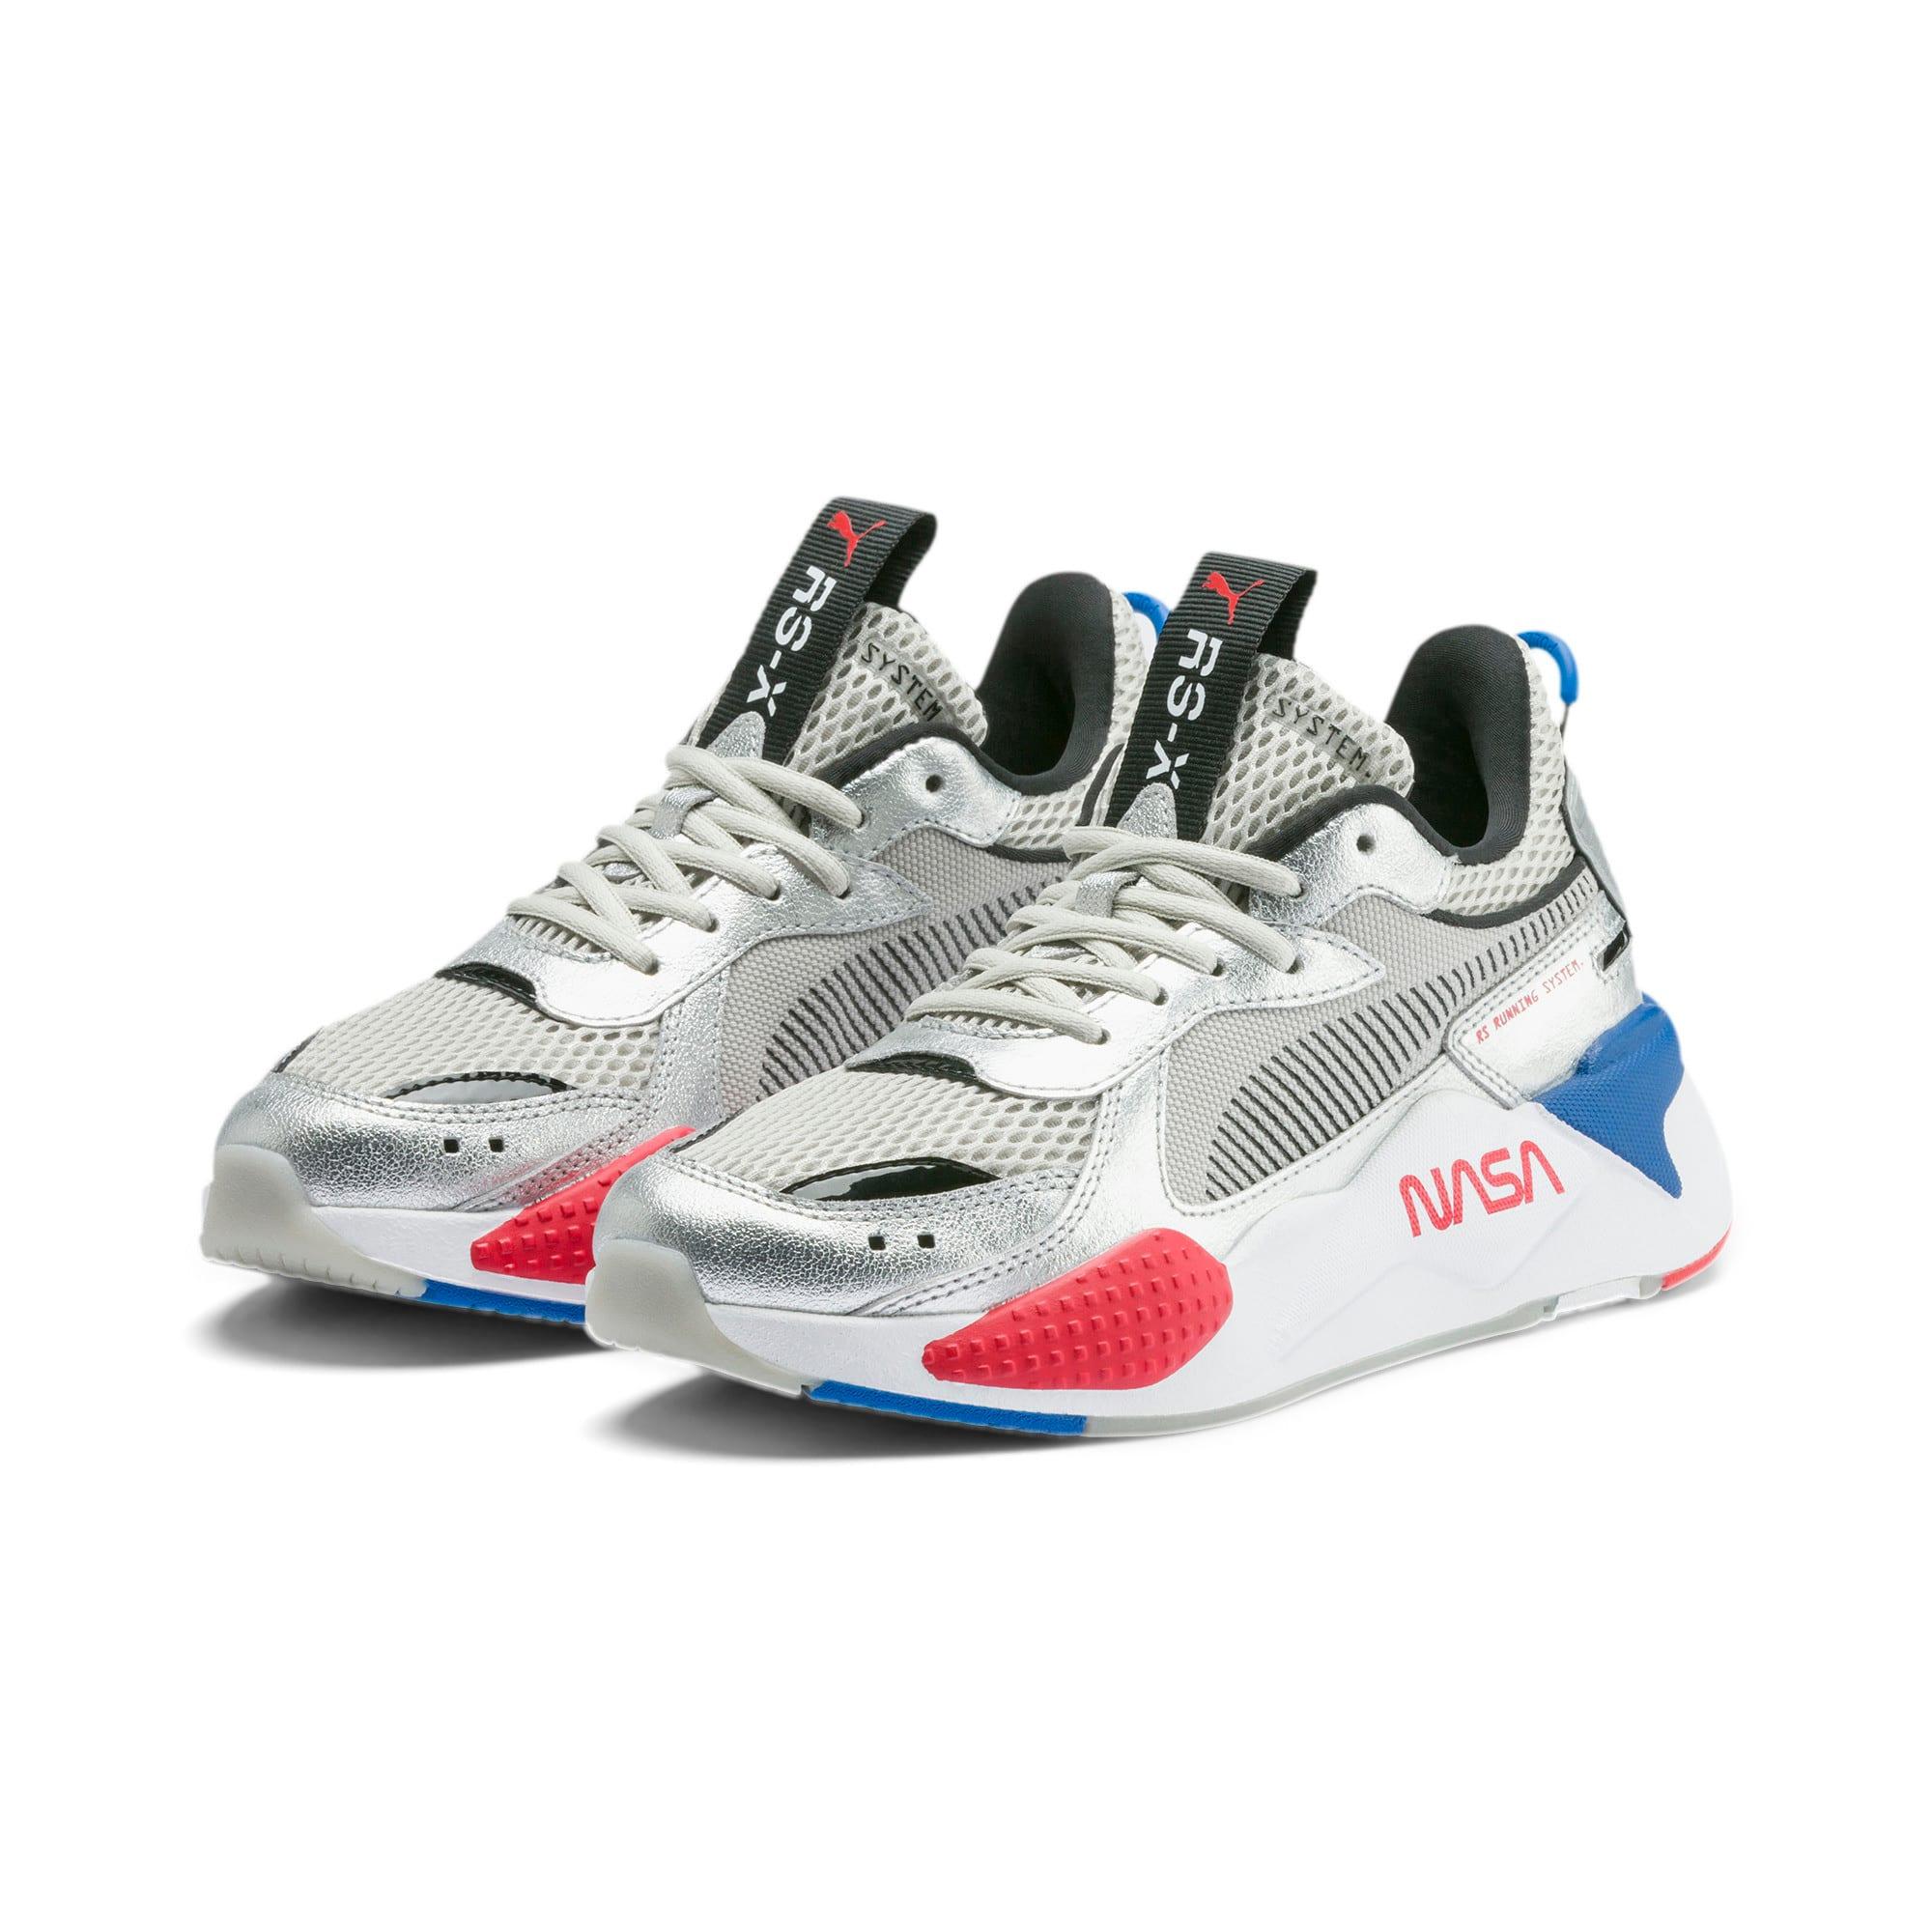 Thumbnail 2 of RS-X Space Agency Sneakers JR, Puma Silver-Gray Violet, medium